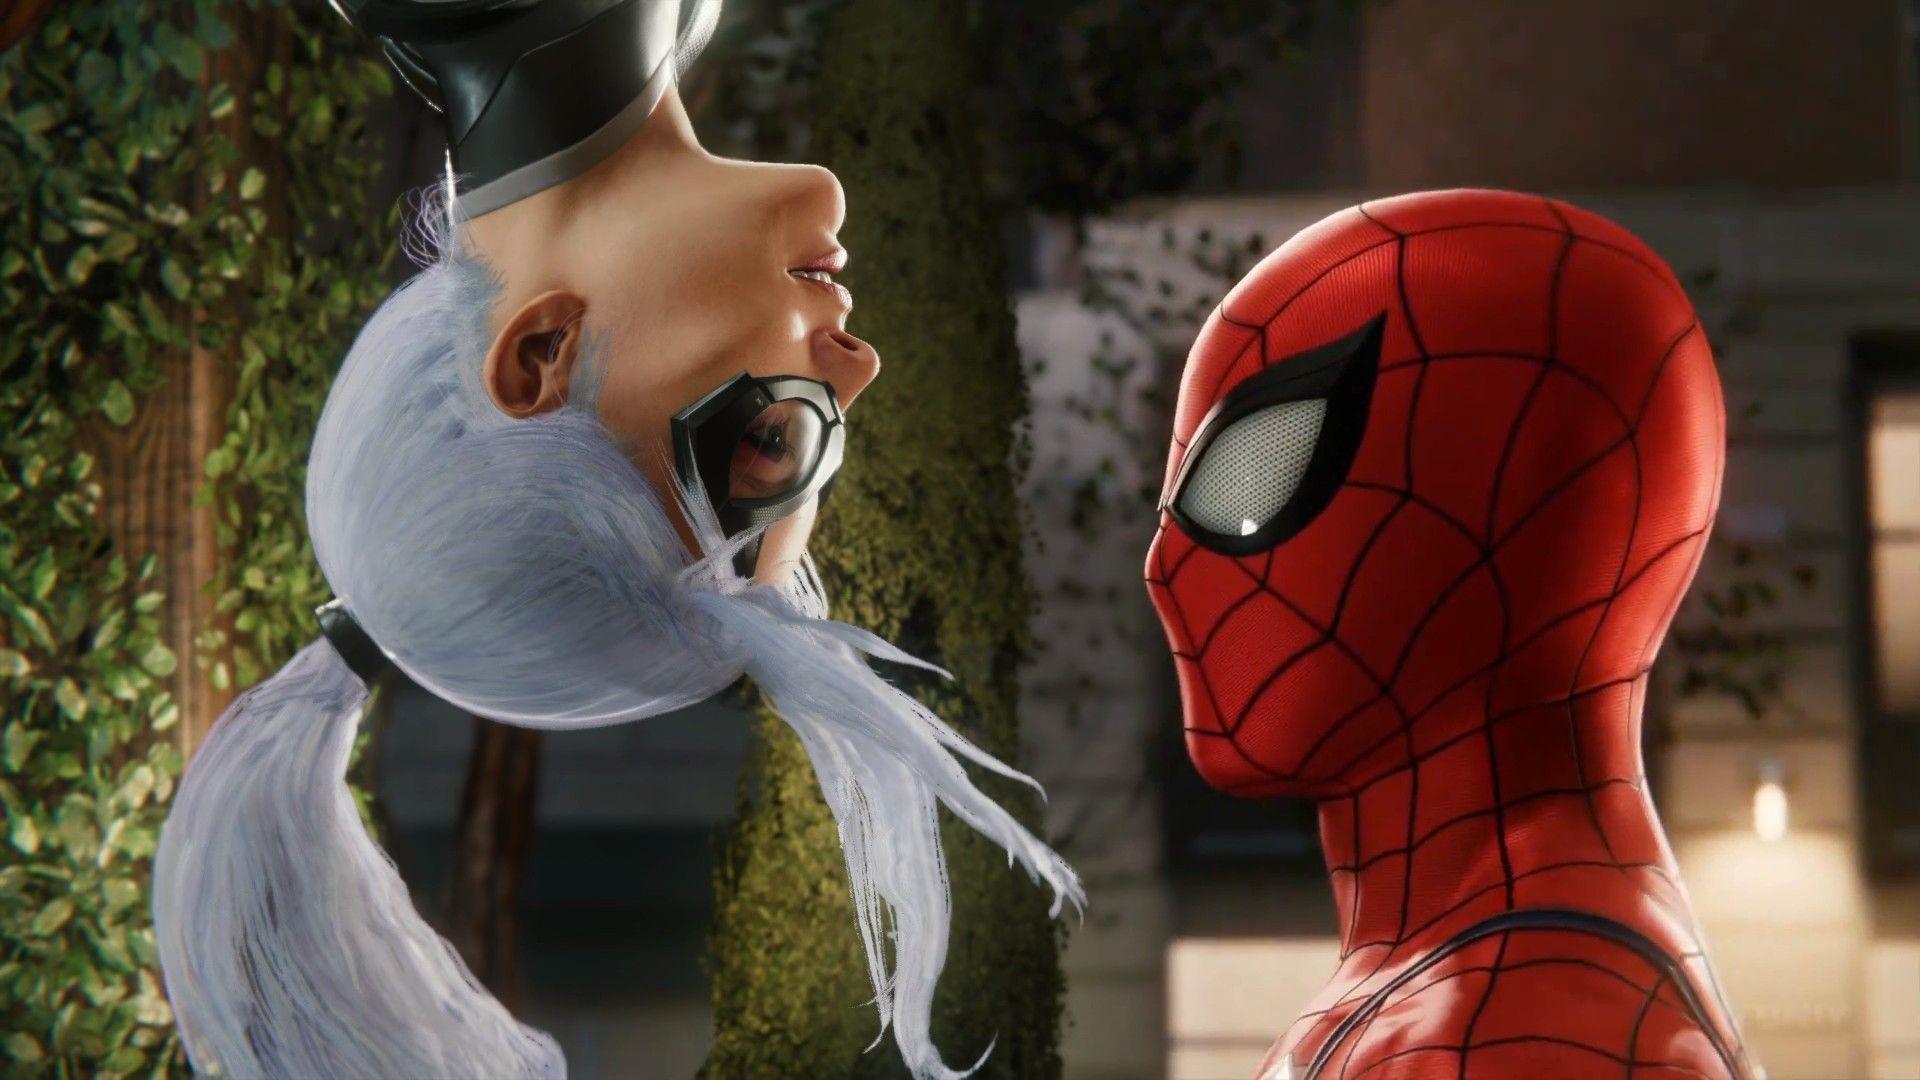 Re Ignite The Flame Black Cat In Marvel S Spider Man The Heist For Ps4 Spiderman Black Cat Black Cat Marvel Spiderman